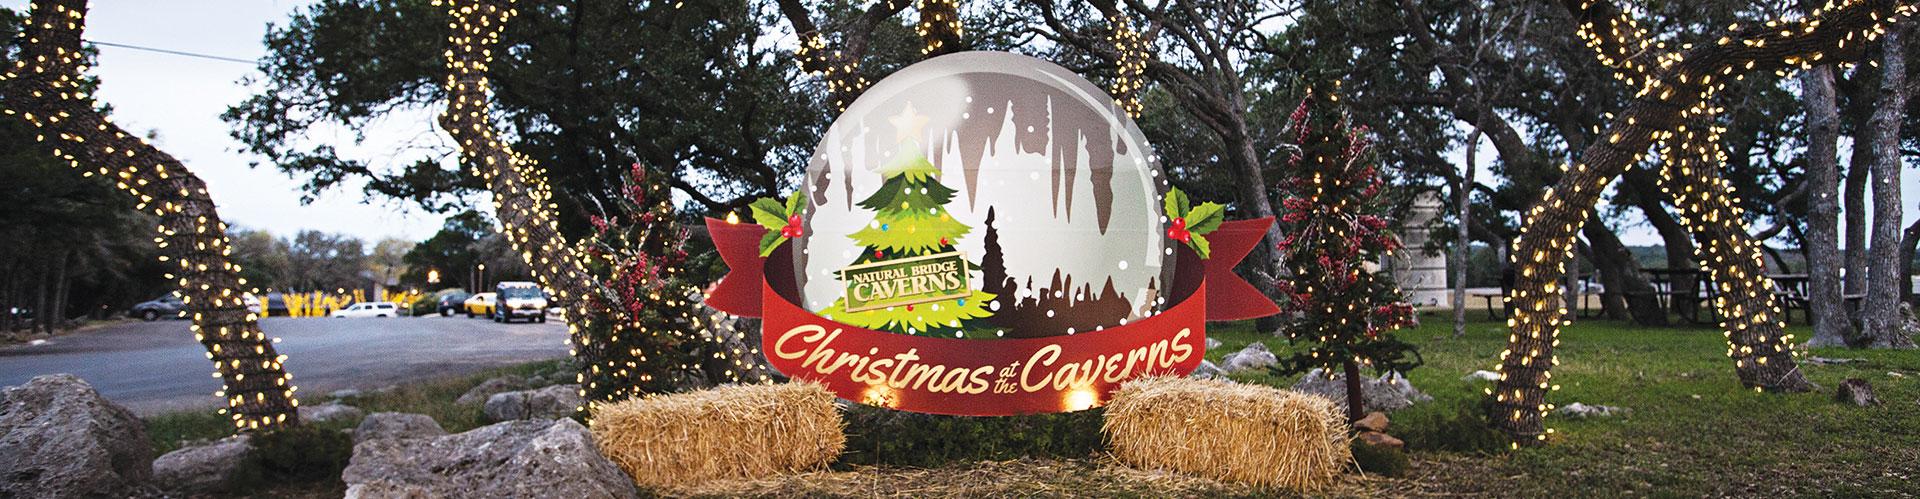 Christmas At the Caverns Photo Spot